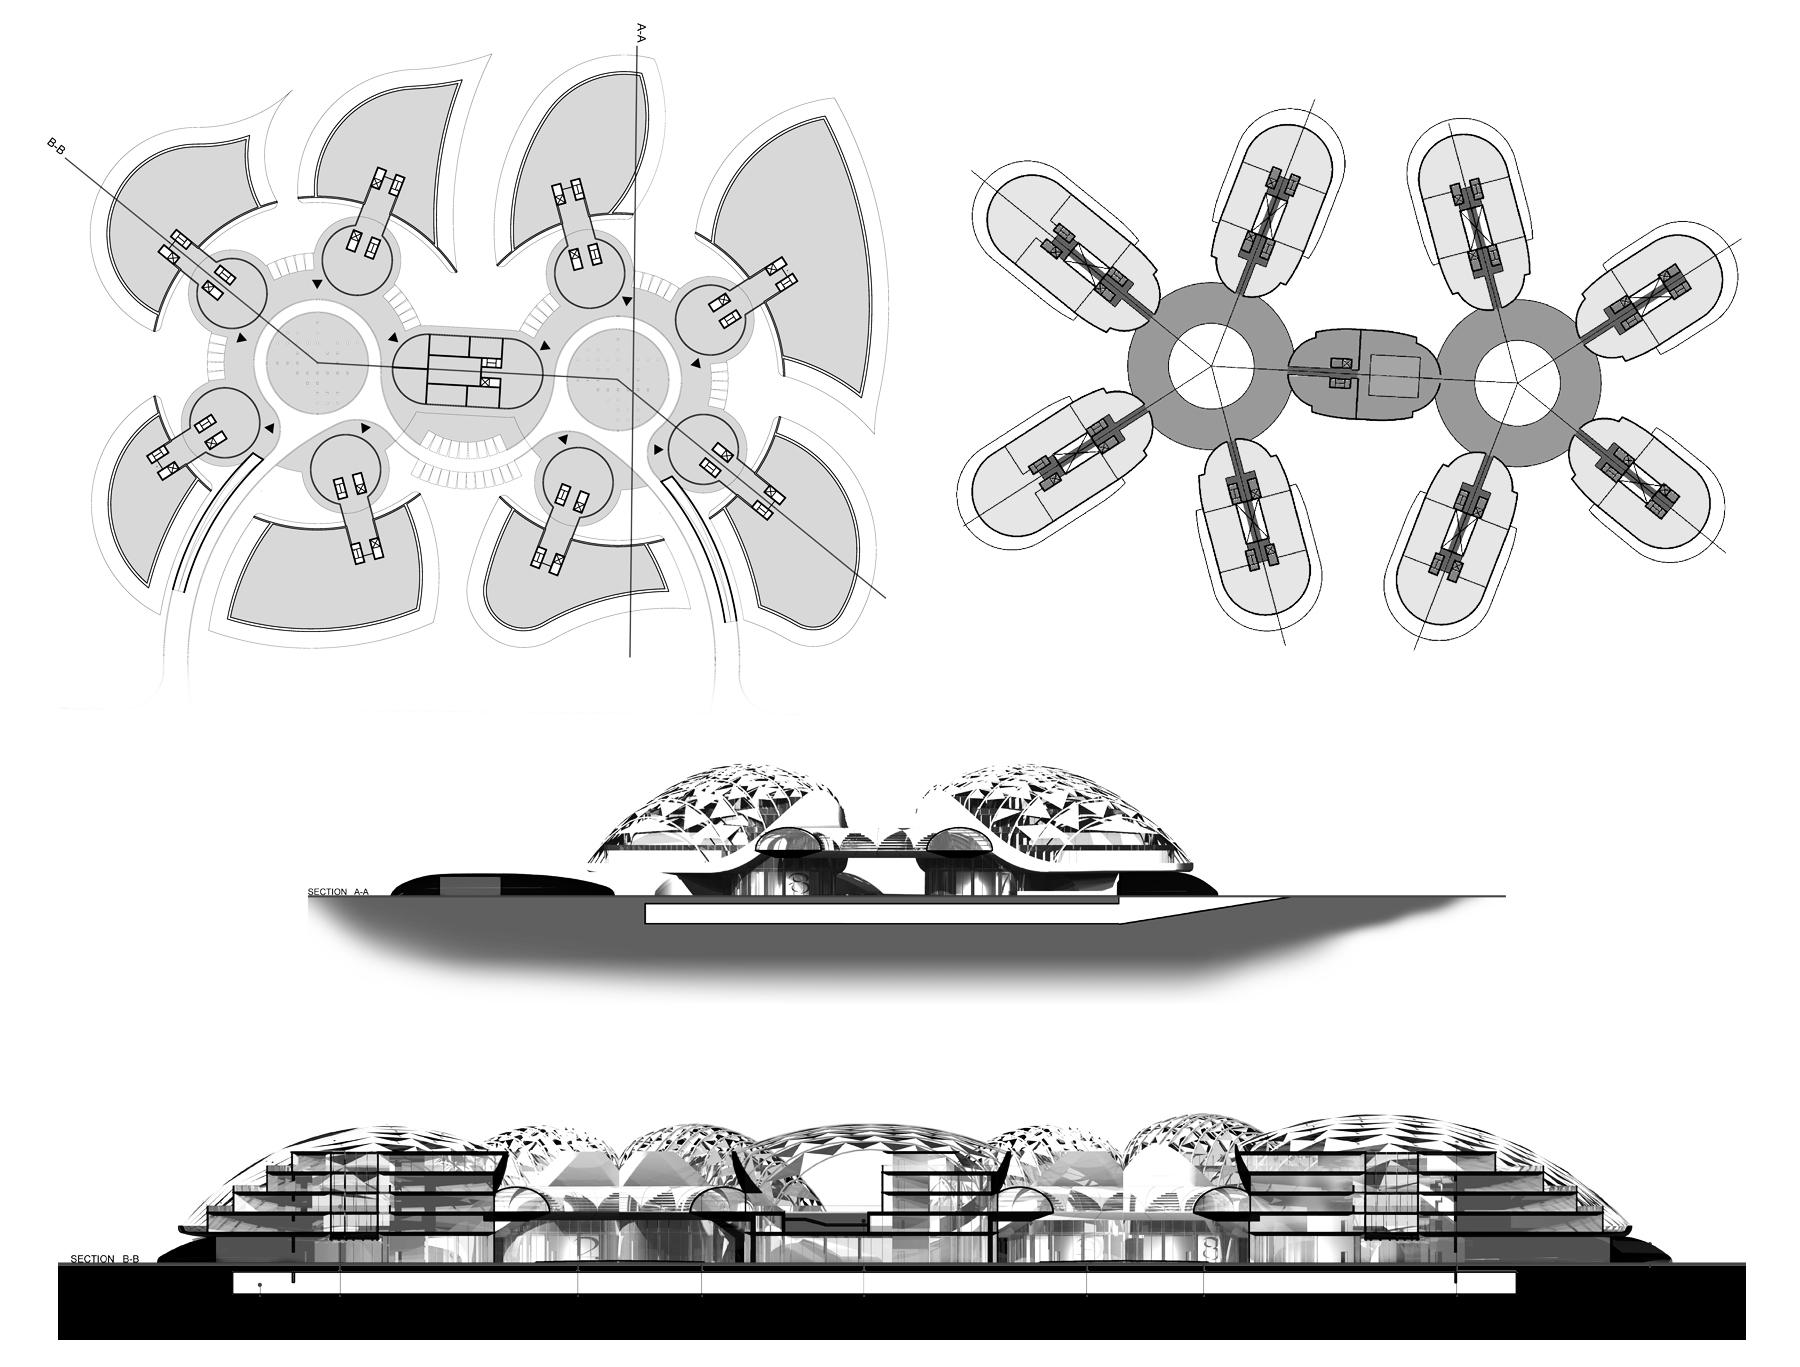 BEAD Mushrif Abu Dhabi Residential drawings.JPG